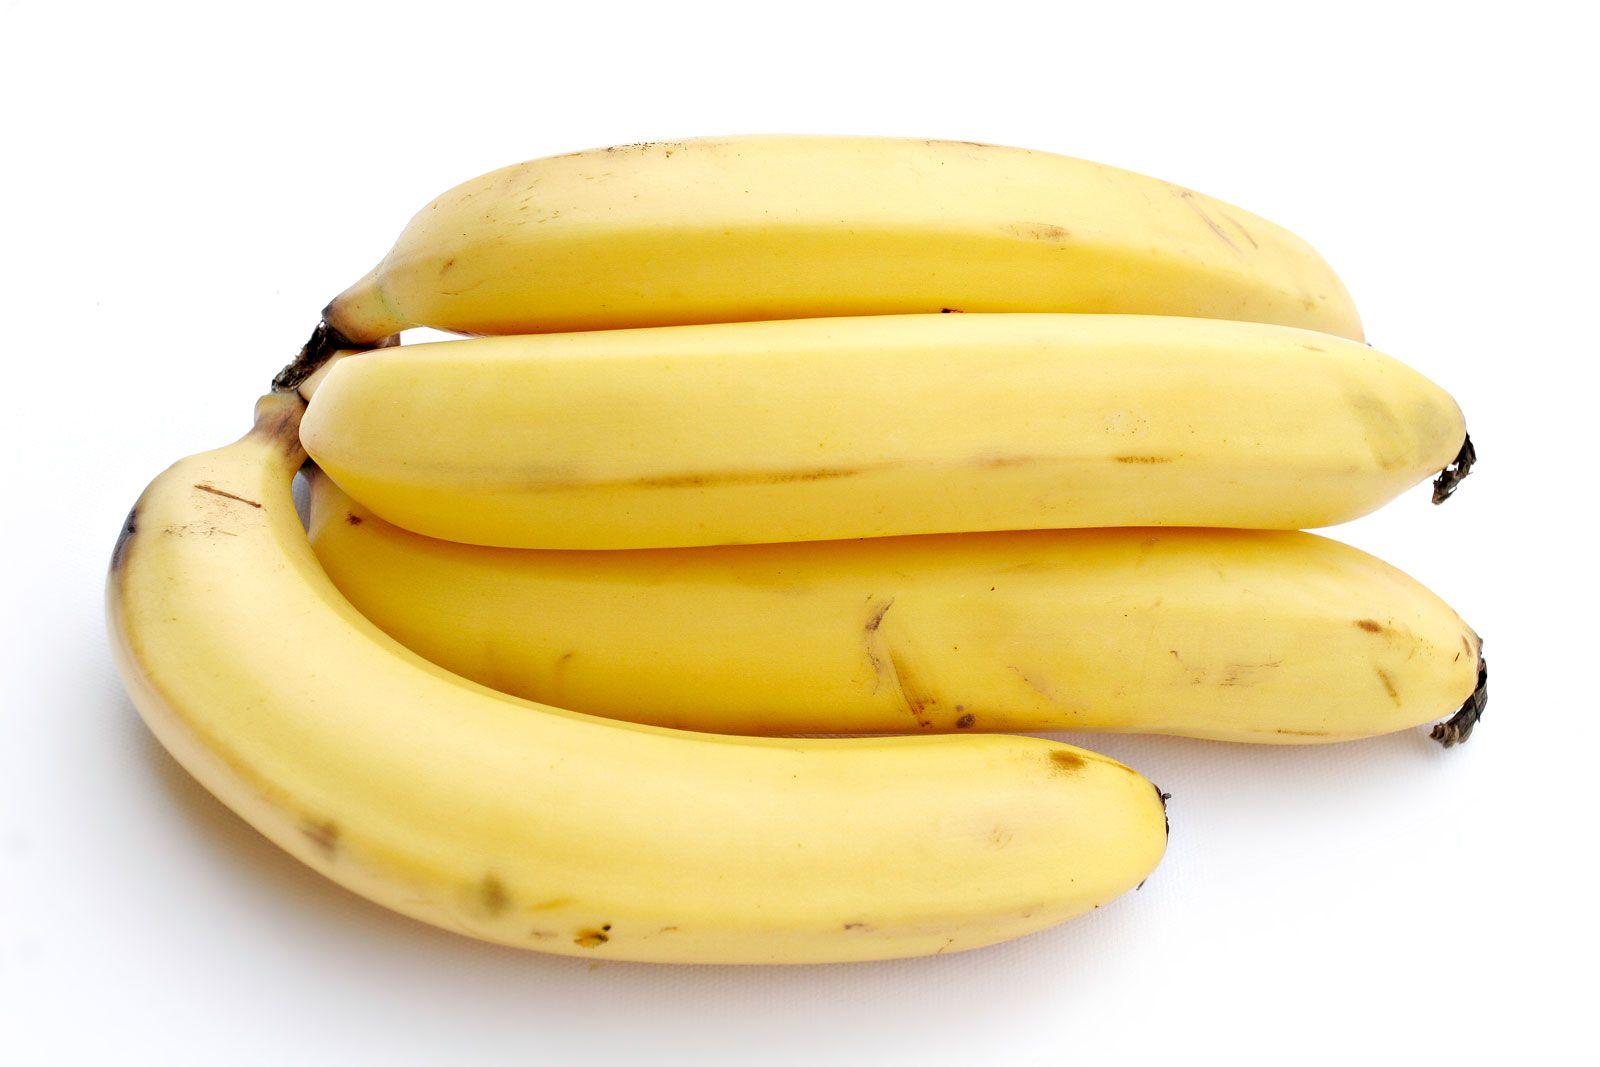 Bananas_white_background.jpg (1600×1067)